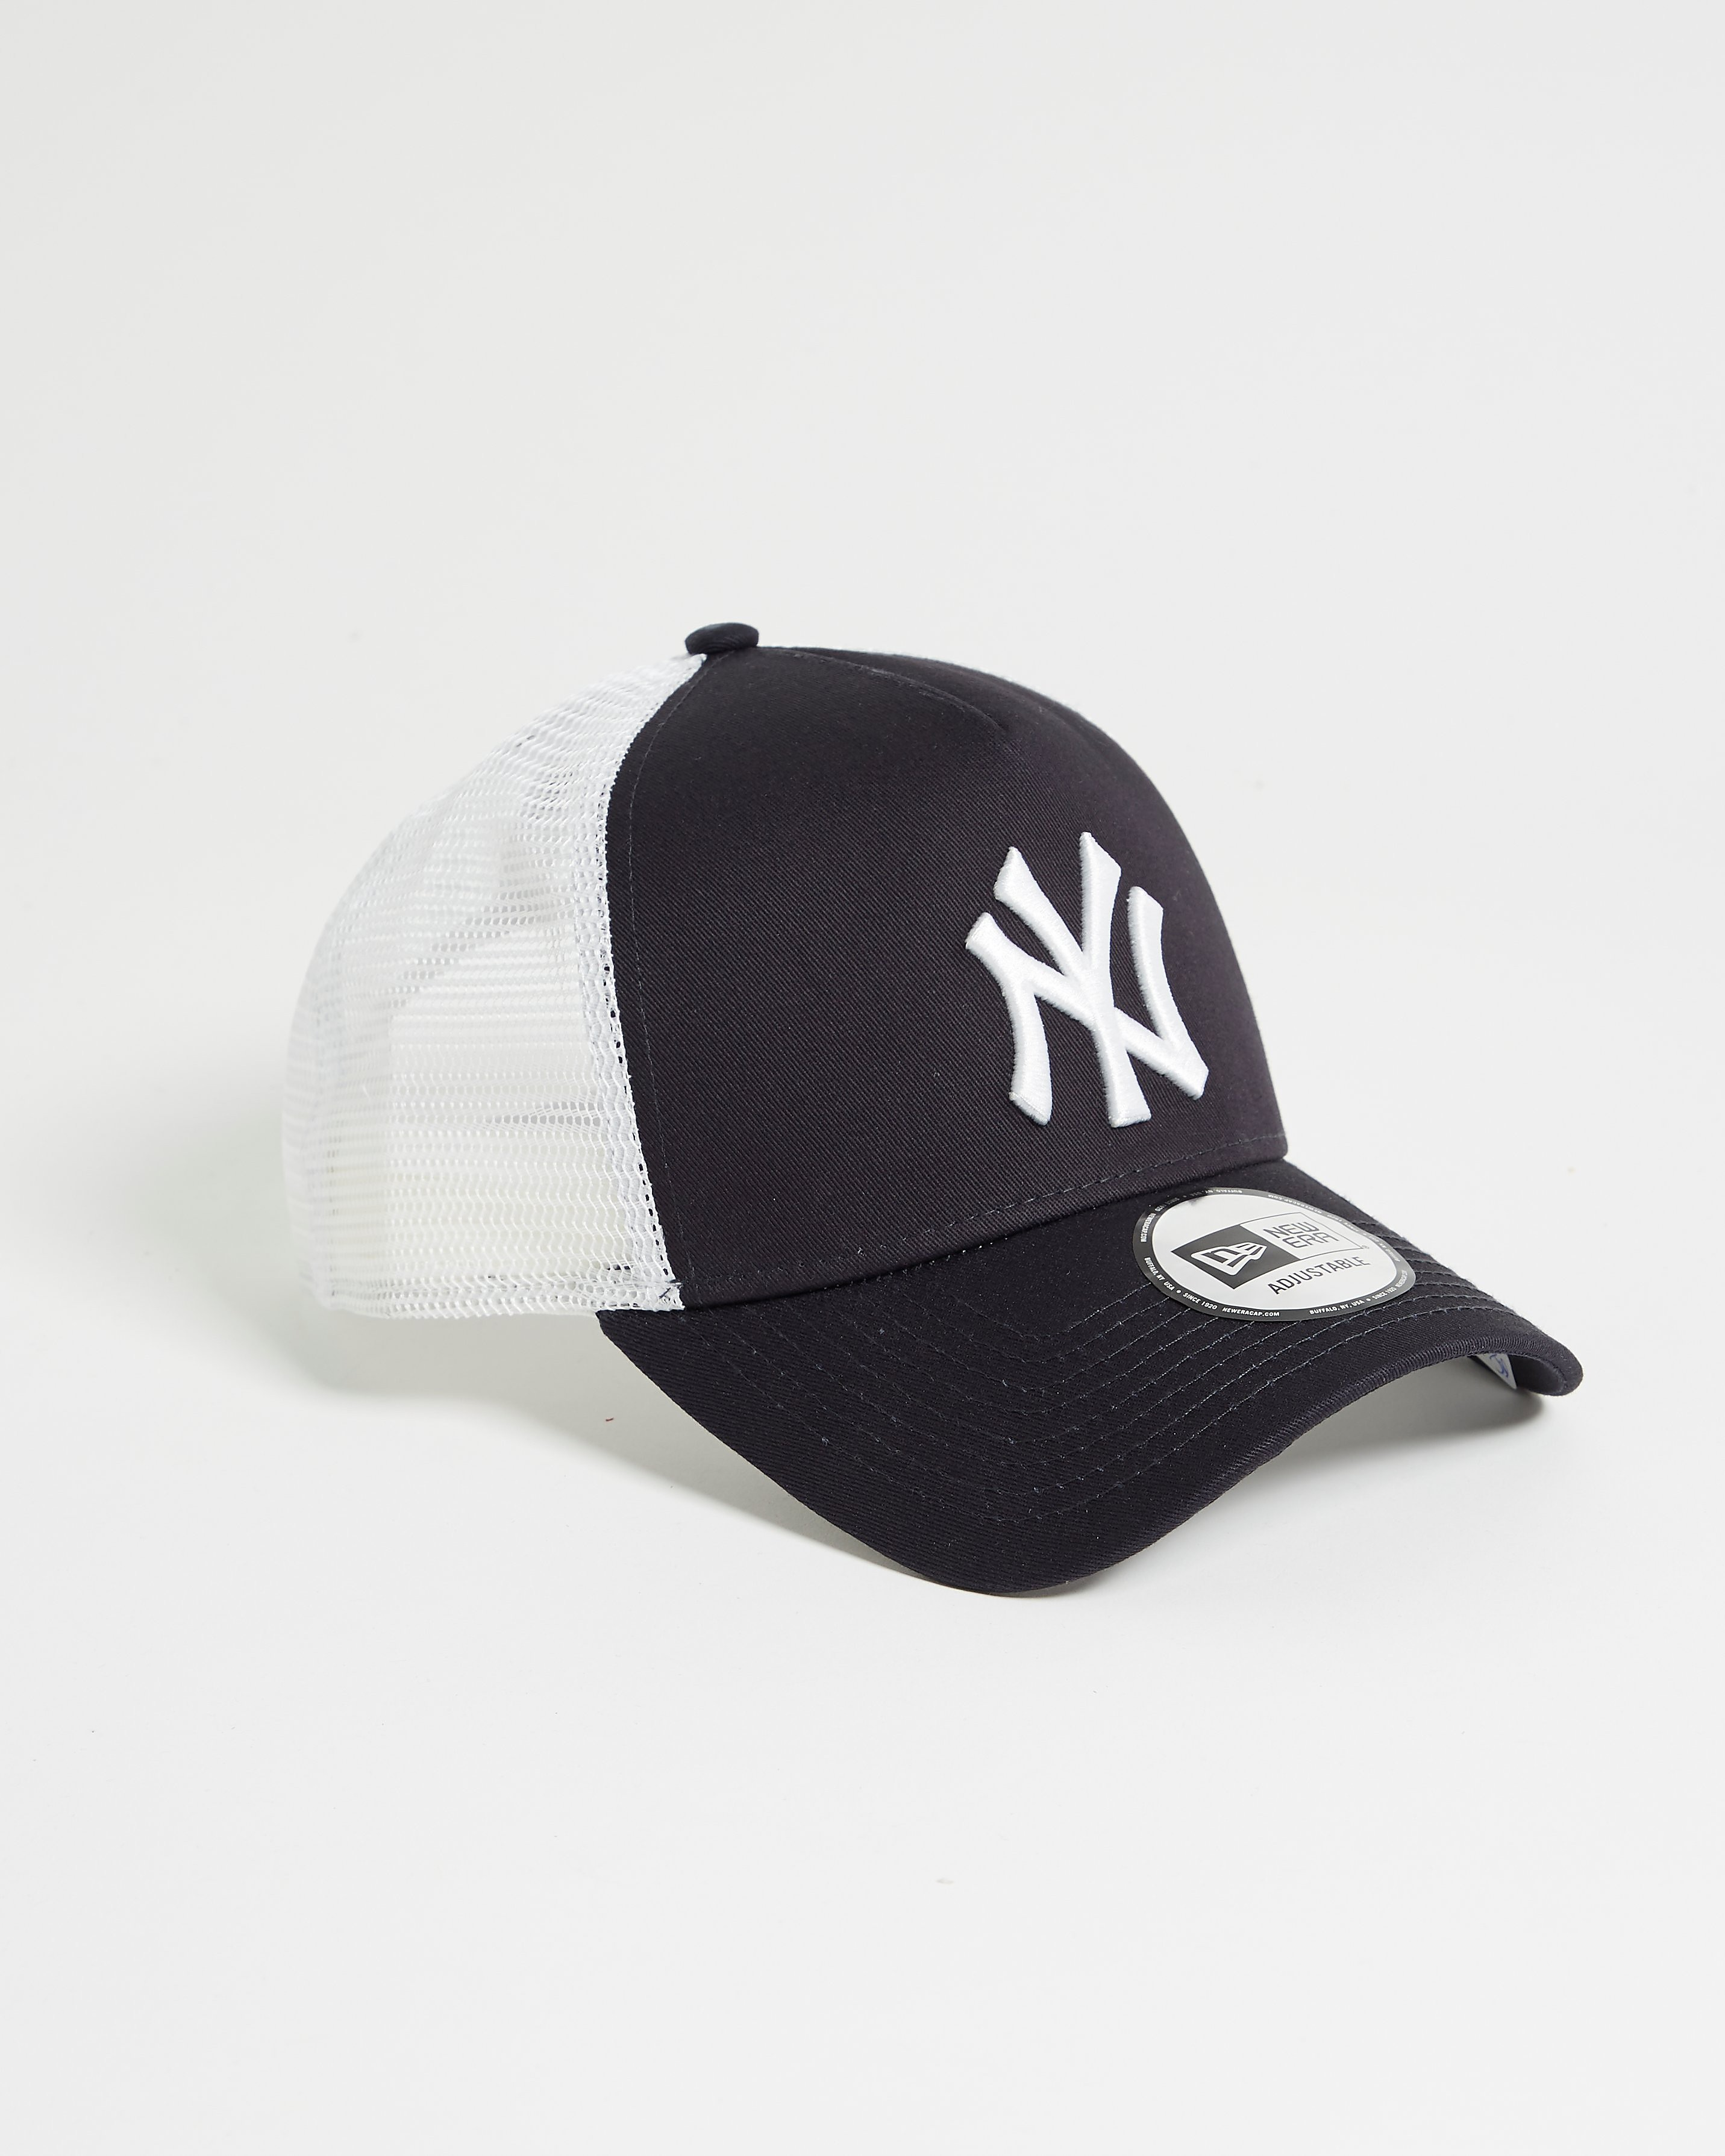 New Era gorra MLB New York Yankees Snapback Trucker